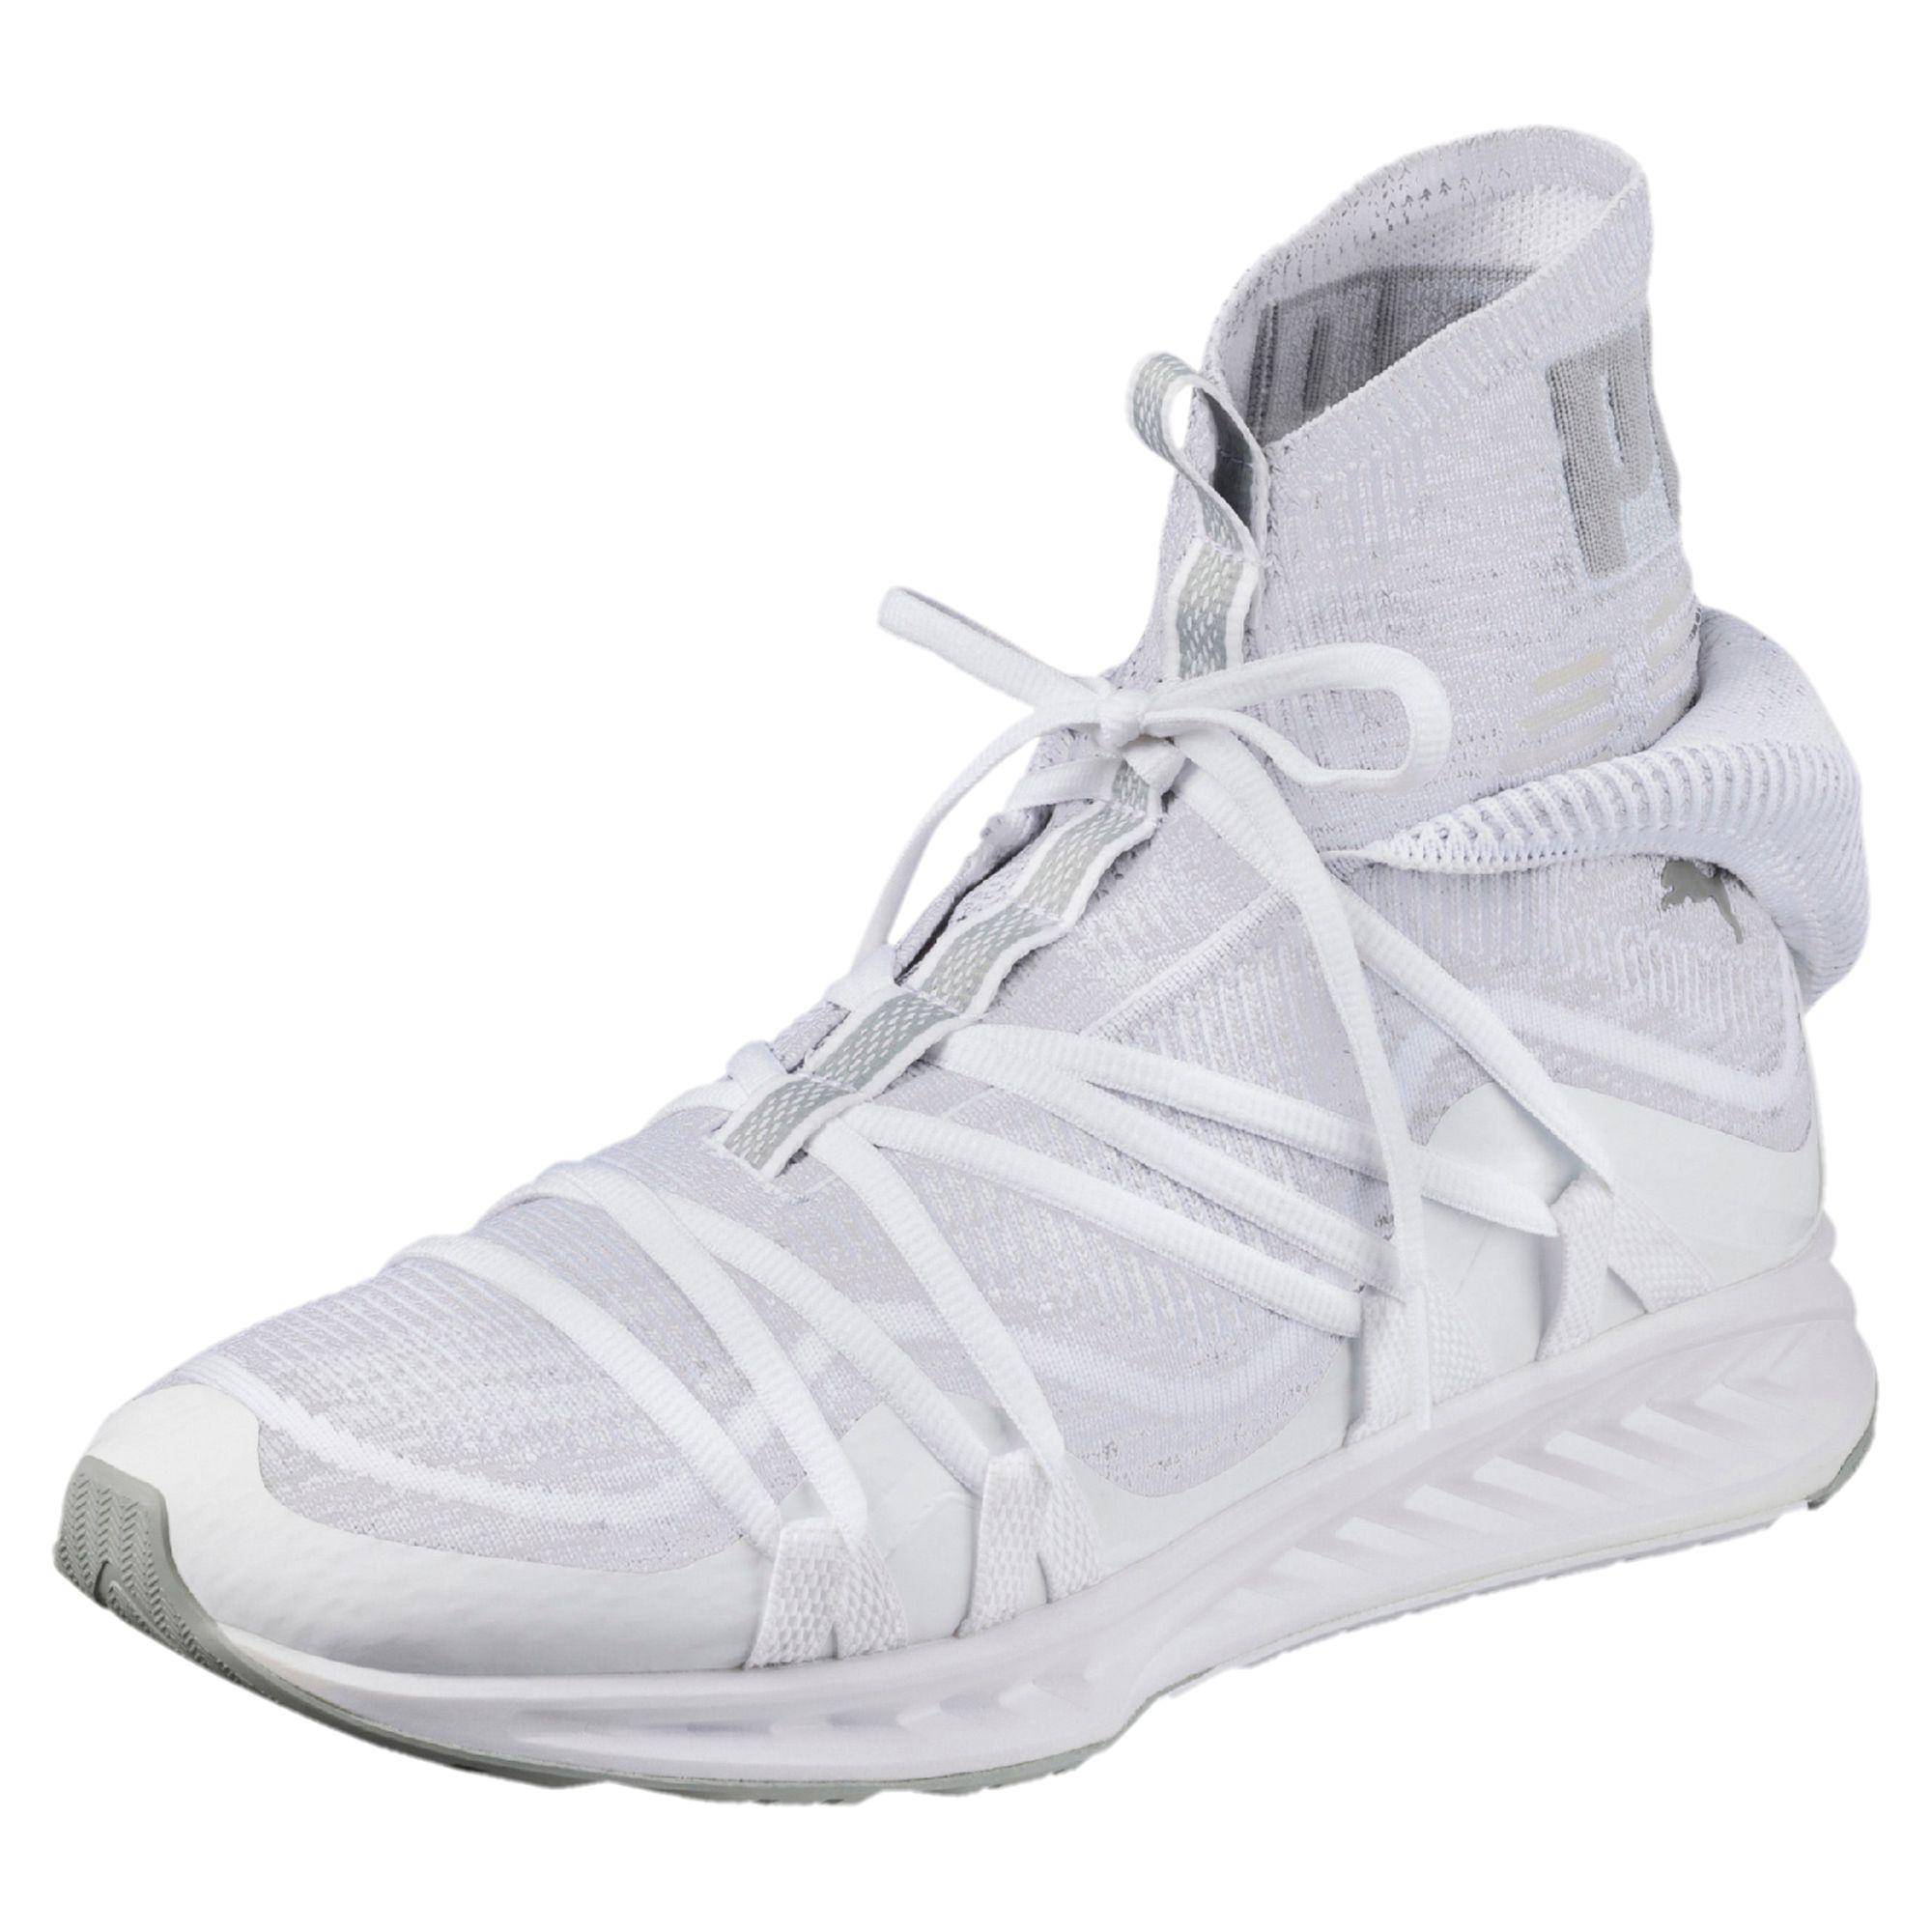 5c0225838ed6 Lyst - PUMA Ignite Evoknit Fold Men s Training Shoes in White for Men